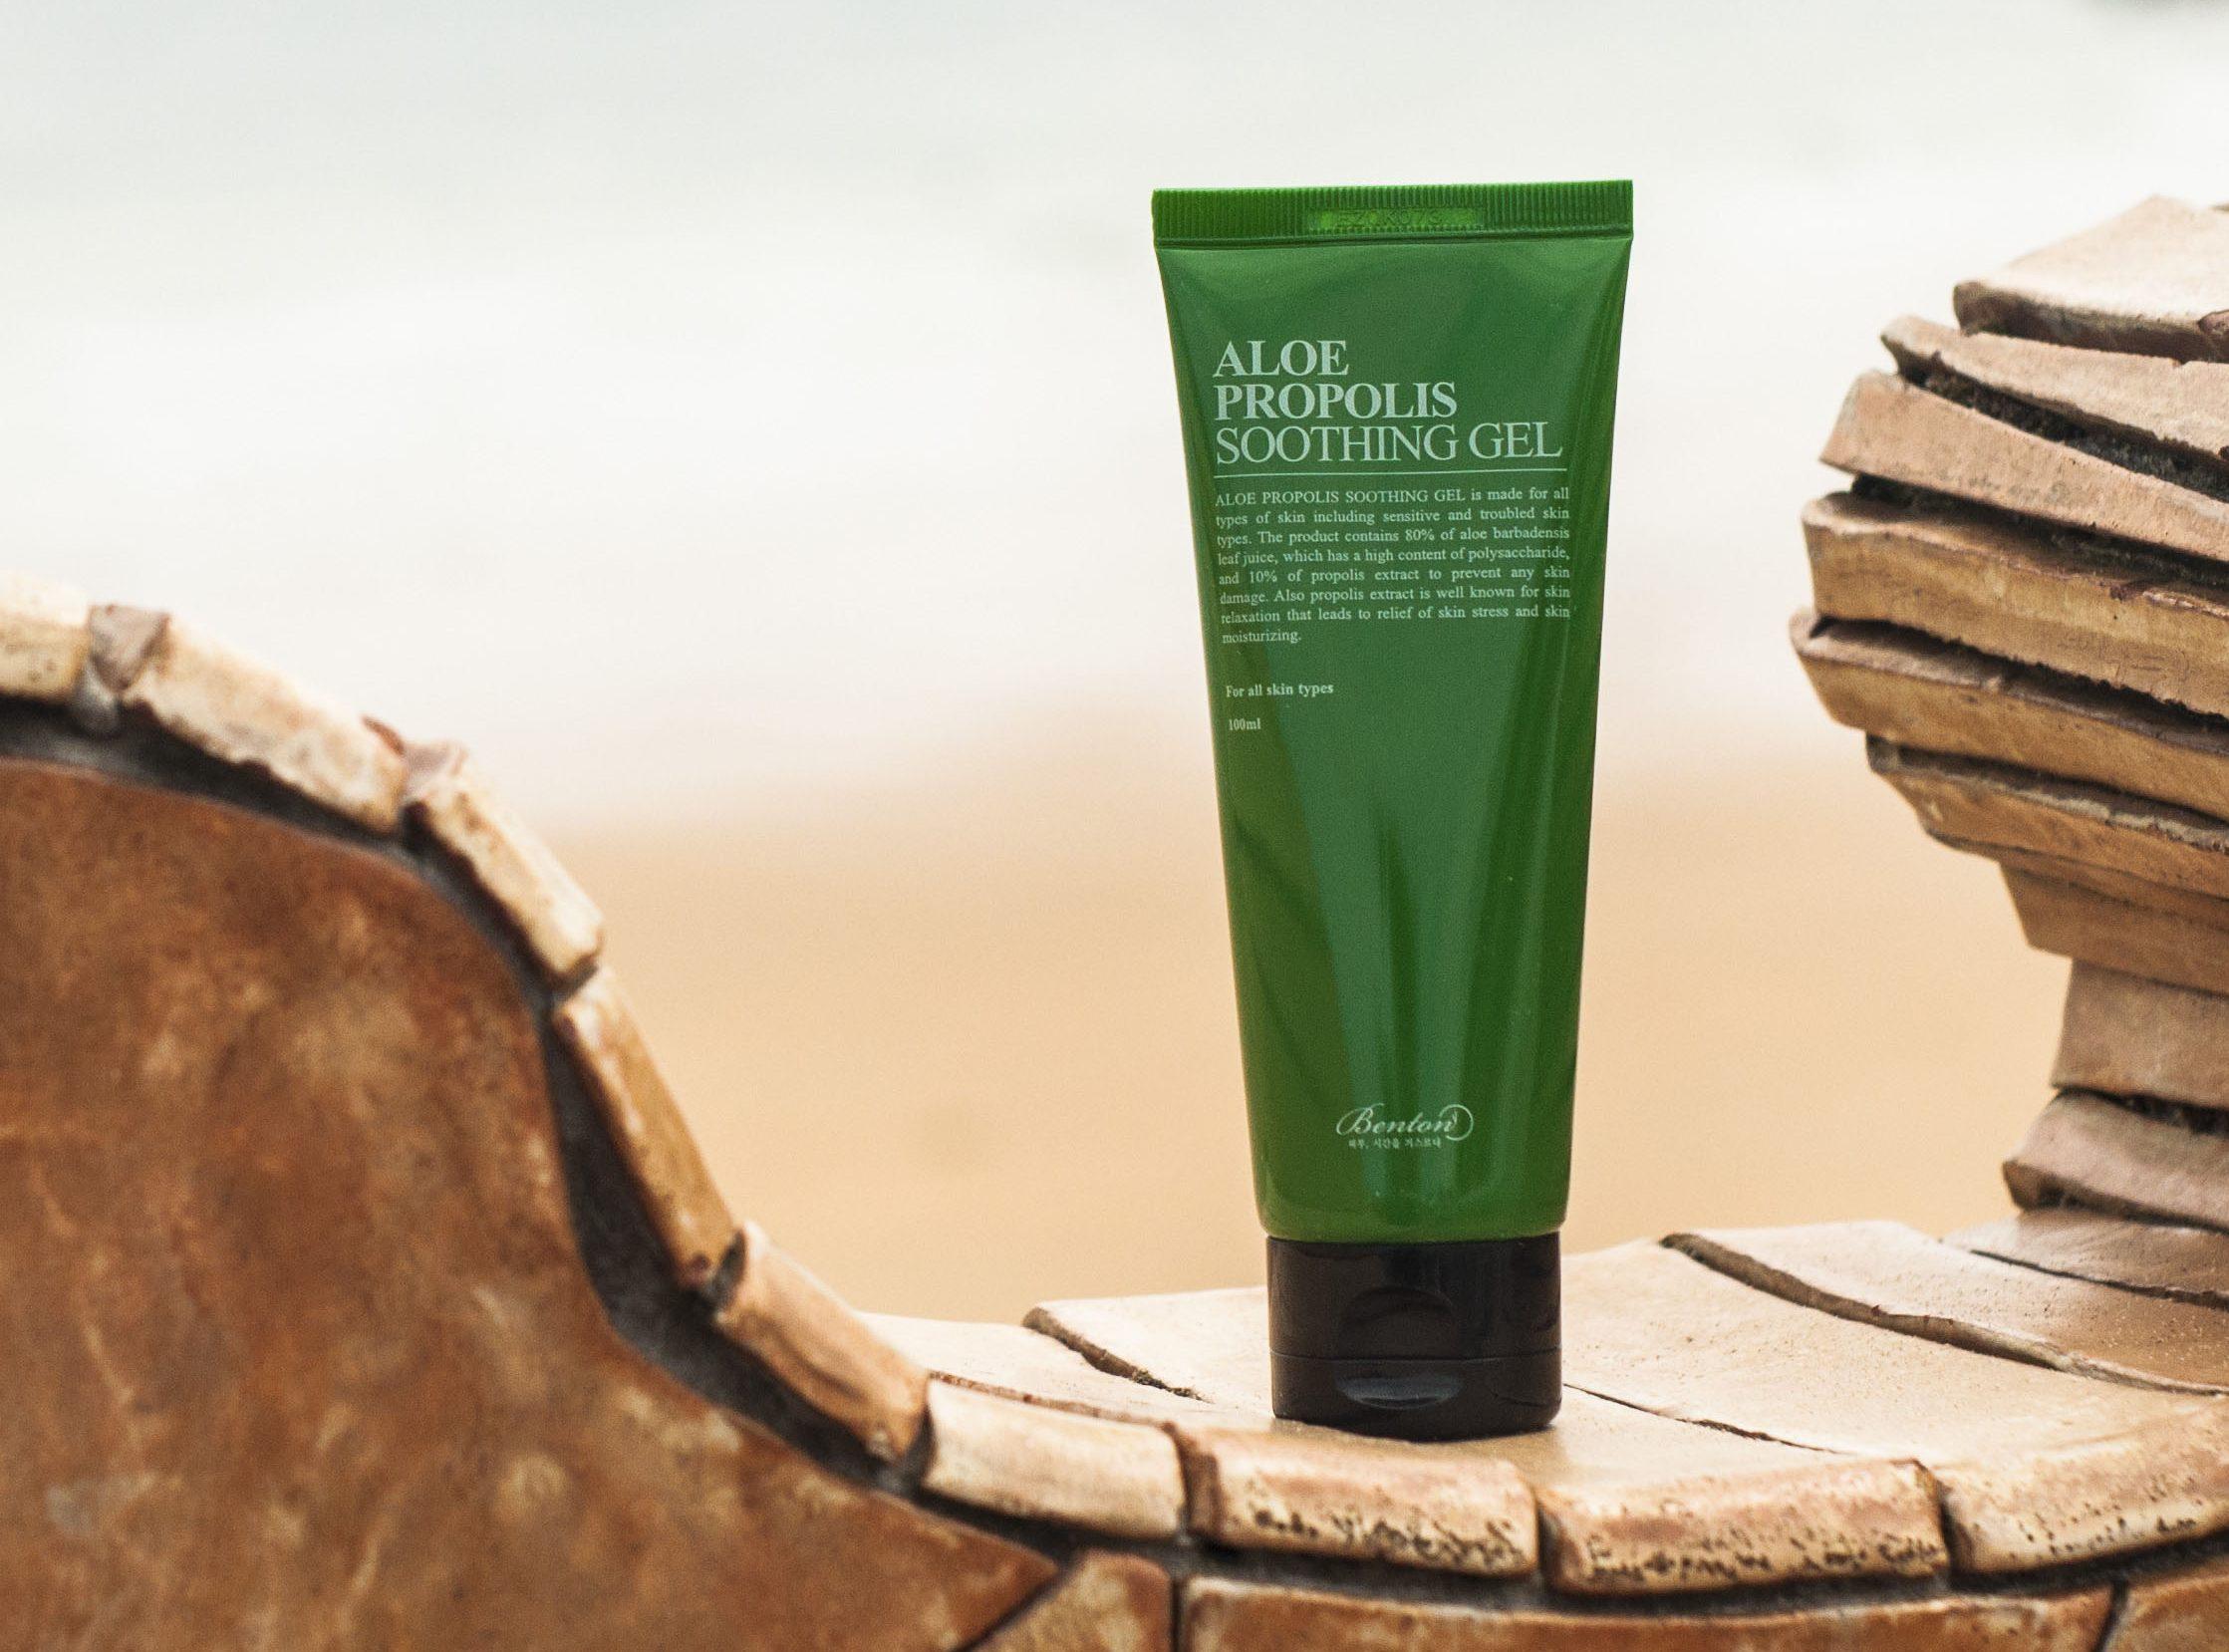 Benton Aloe Propolis Soothing Gel Blueberry Cosmetics